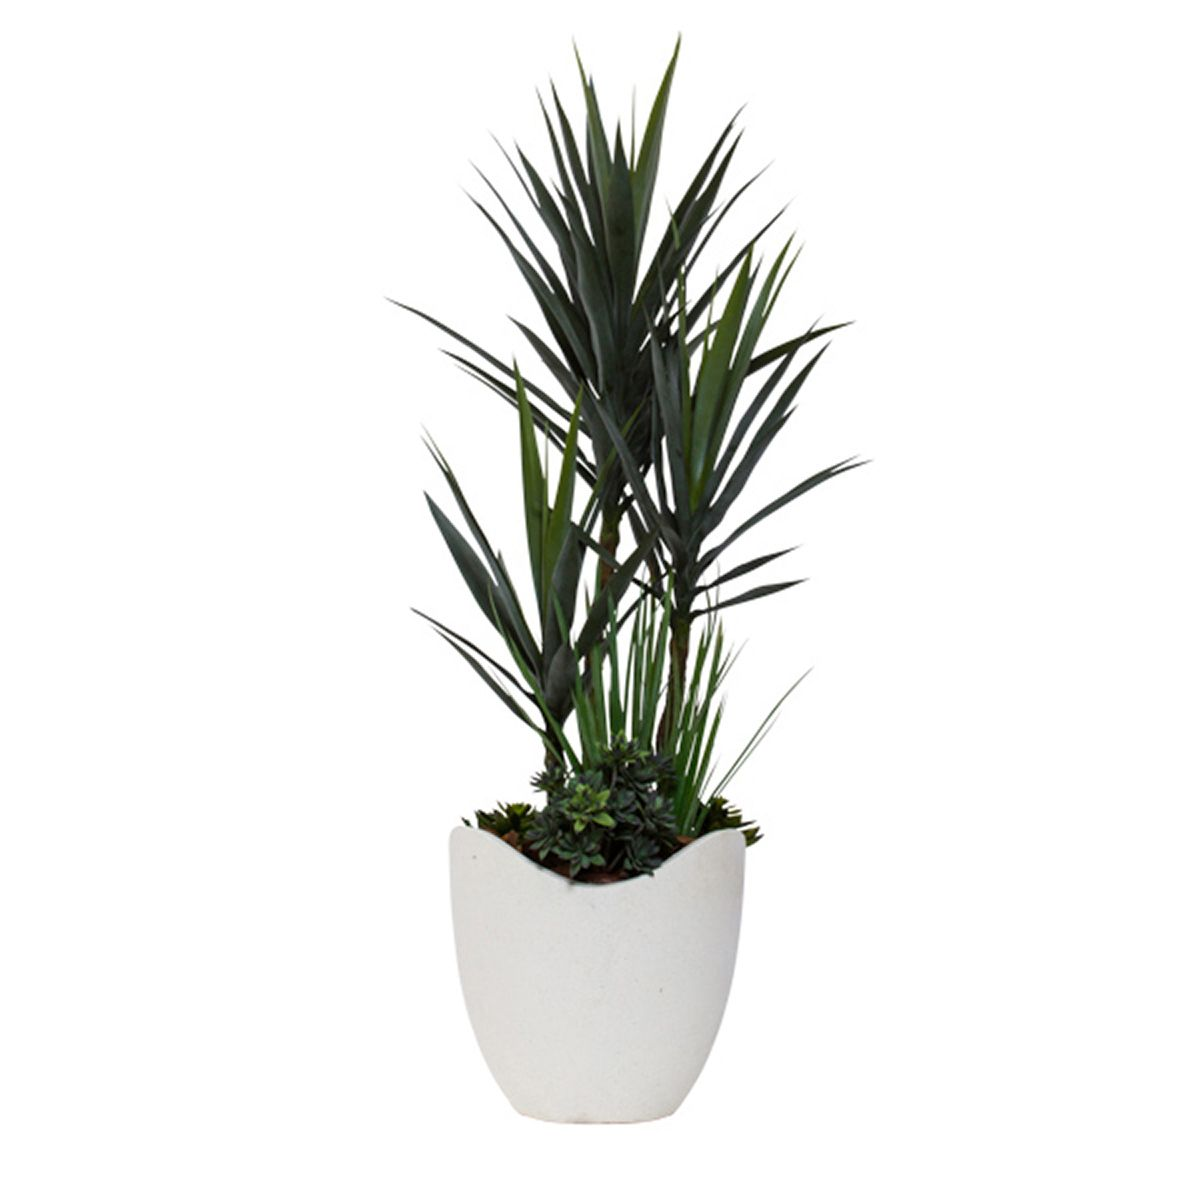 Yucca Combination In White Wavy Terrazzo Pot Yucca, Pot